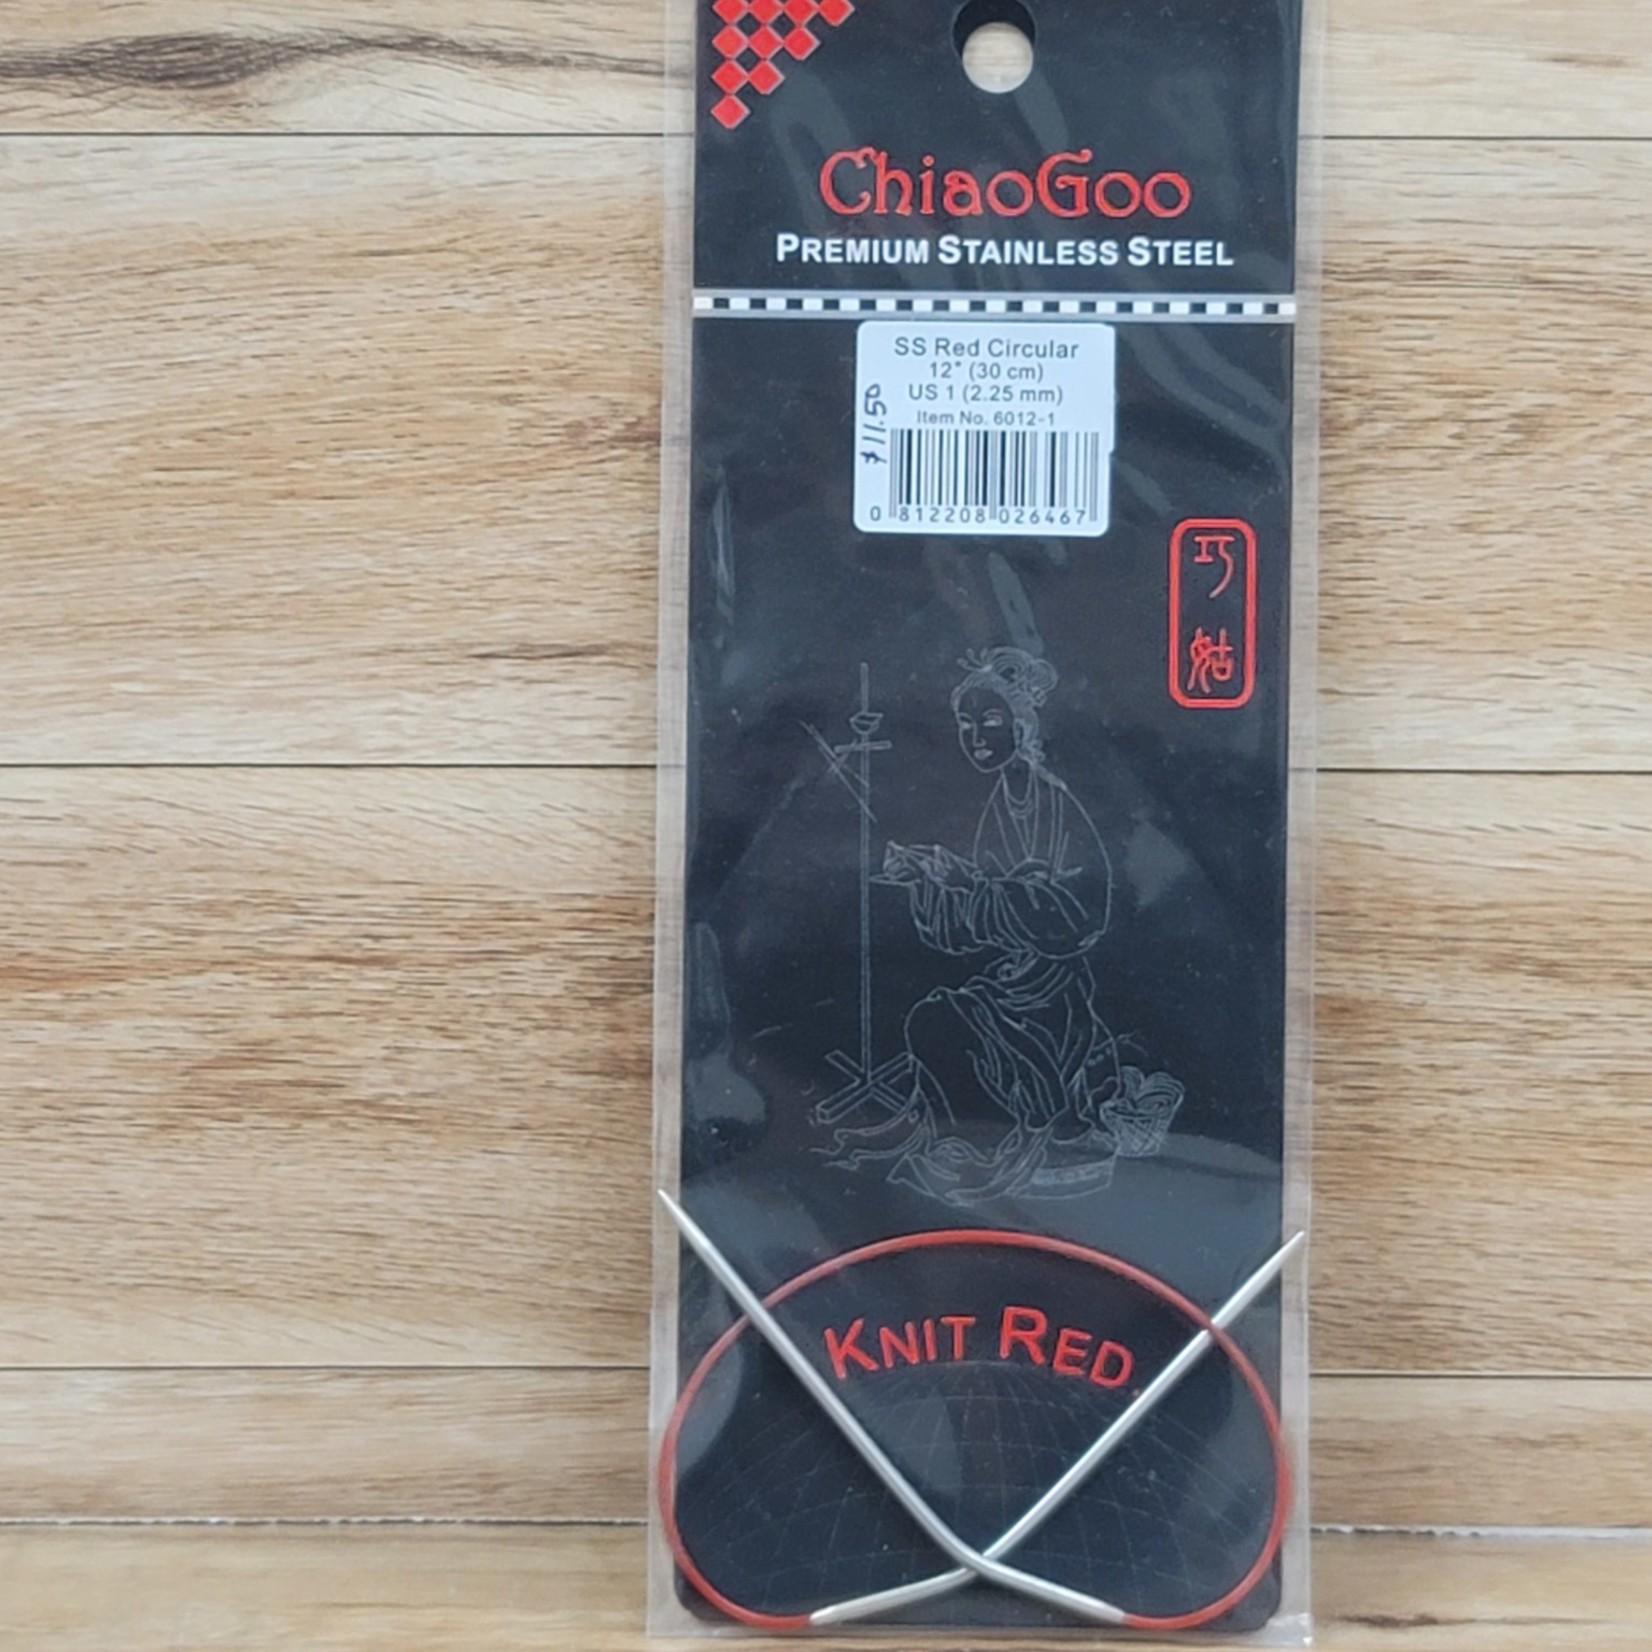 ChiaoGoo - Red Circular Knitting Needles - 12 inch Size 1 (2.25mm)